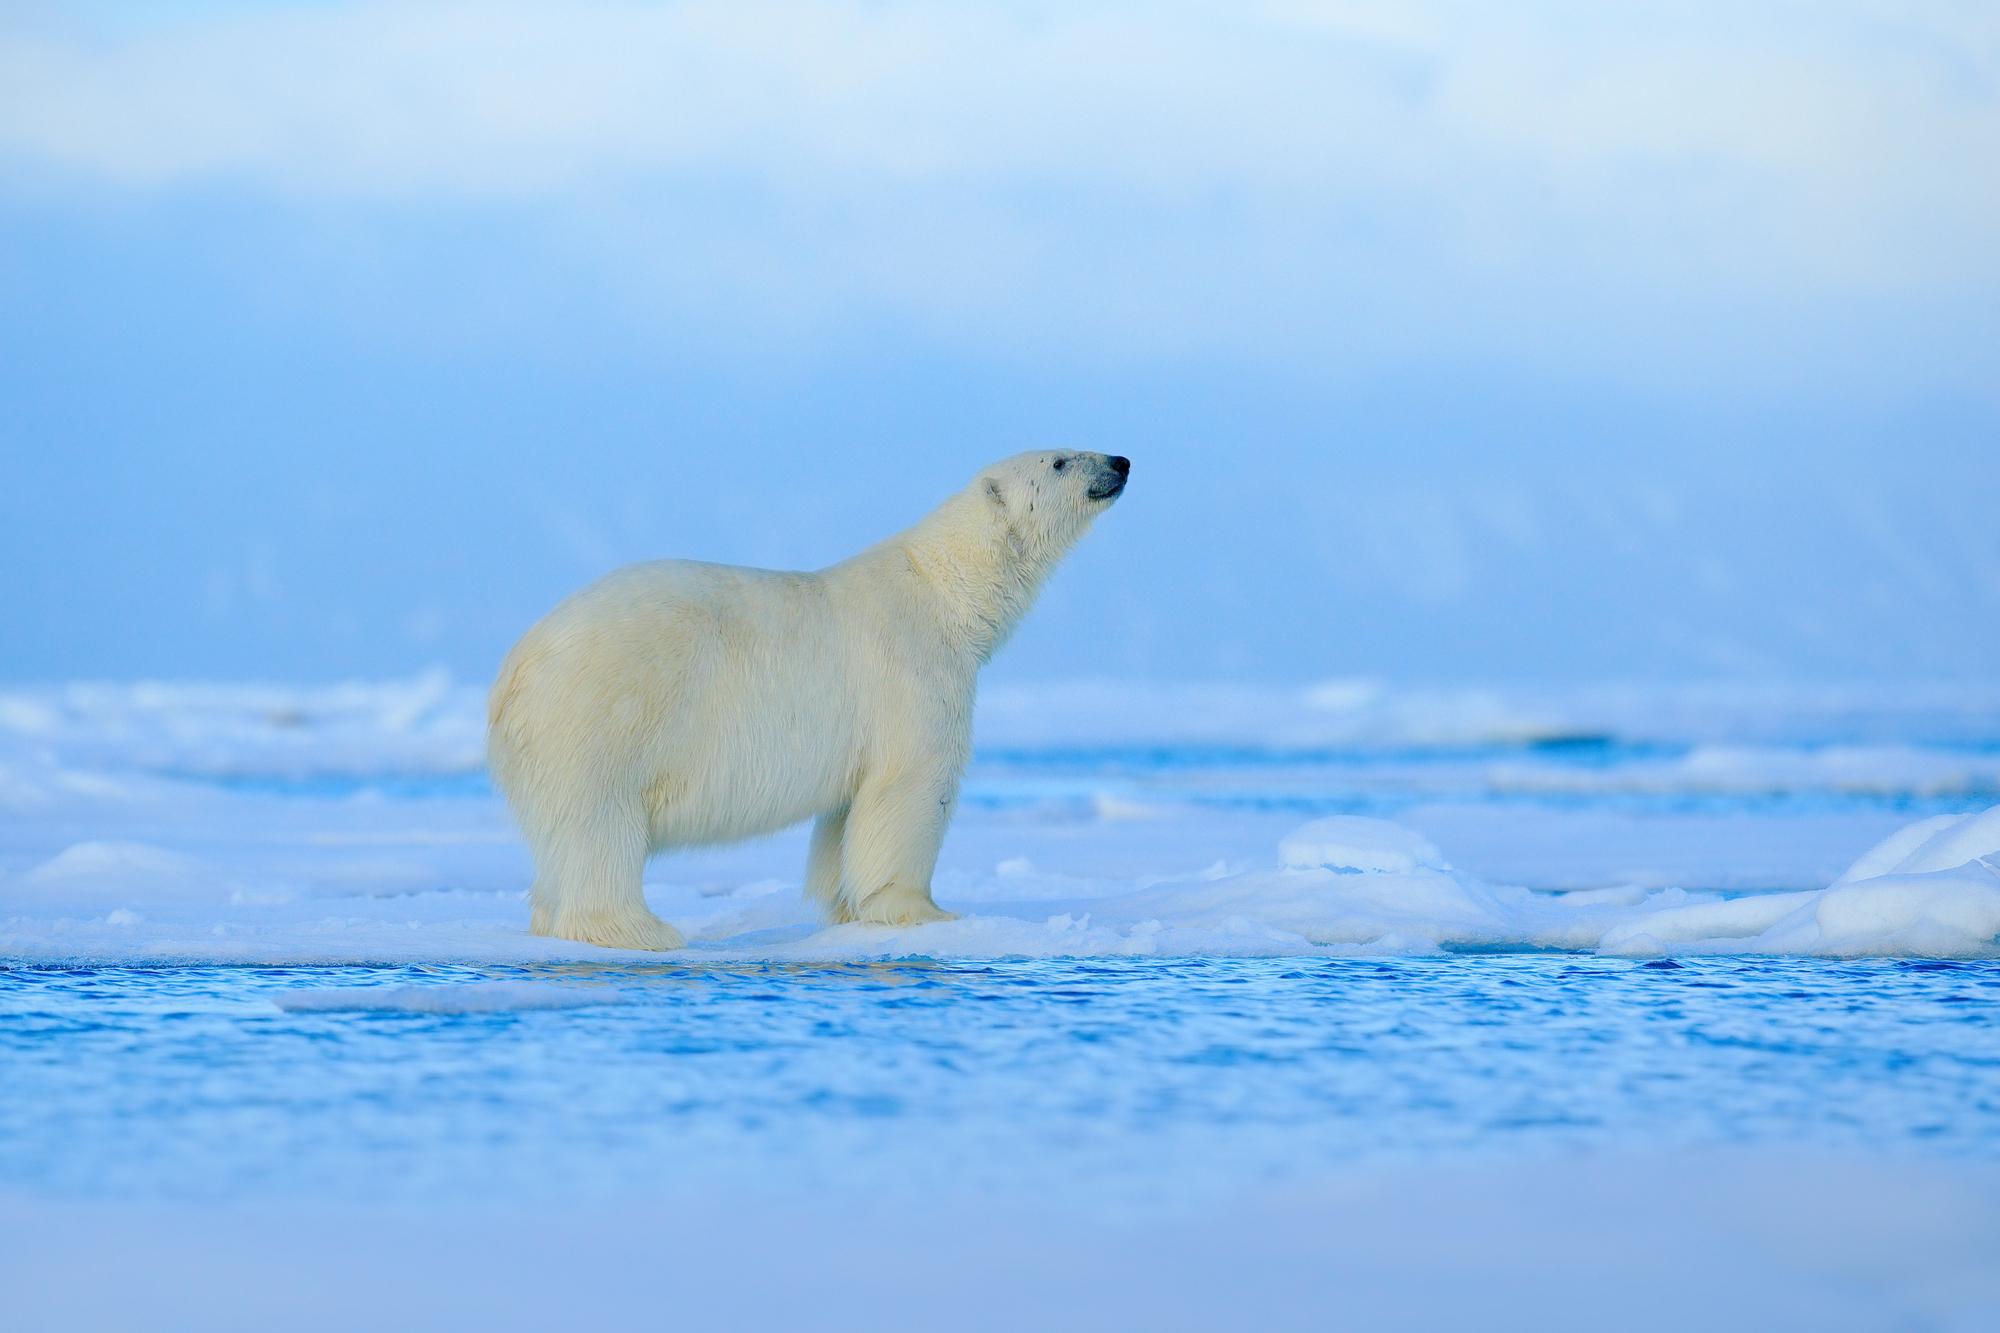 polar-bear-standing-on-ice